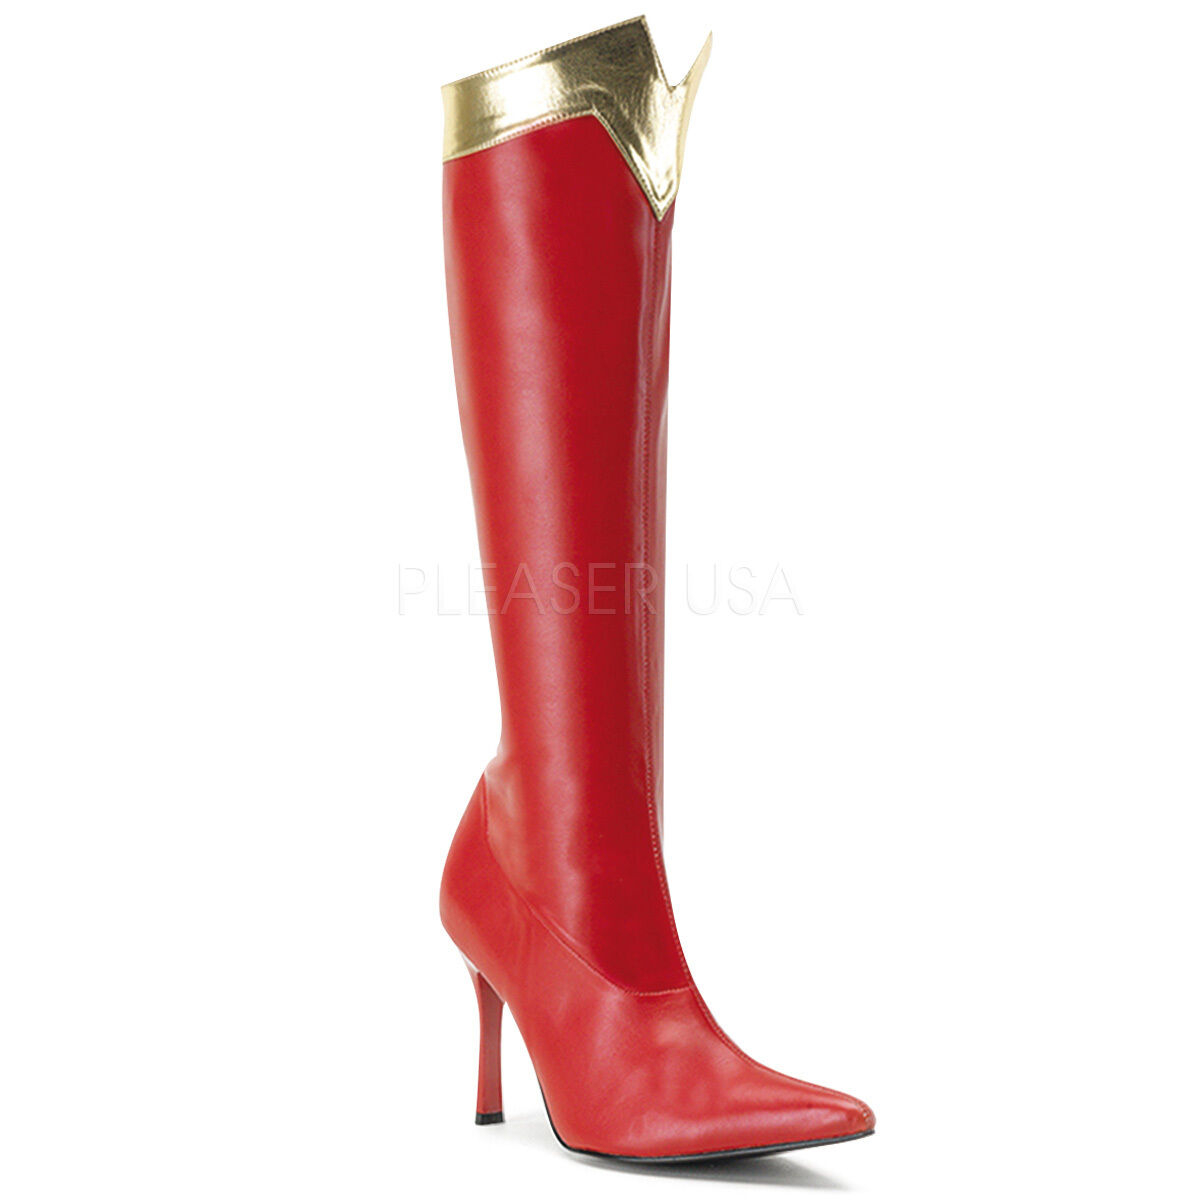 Wonder Woman Super Girl Hero Amazon Halloween Red Costume shoes Cosplay Boots